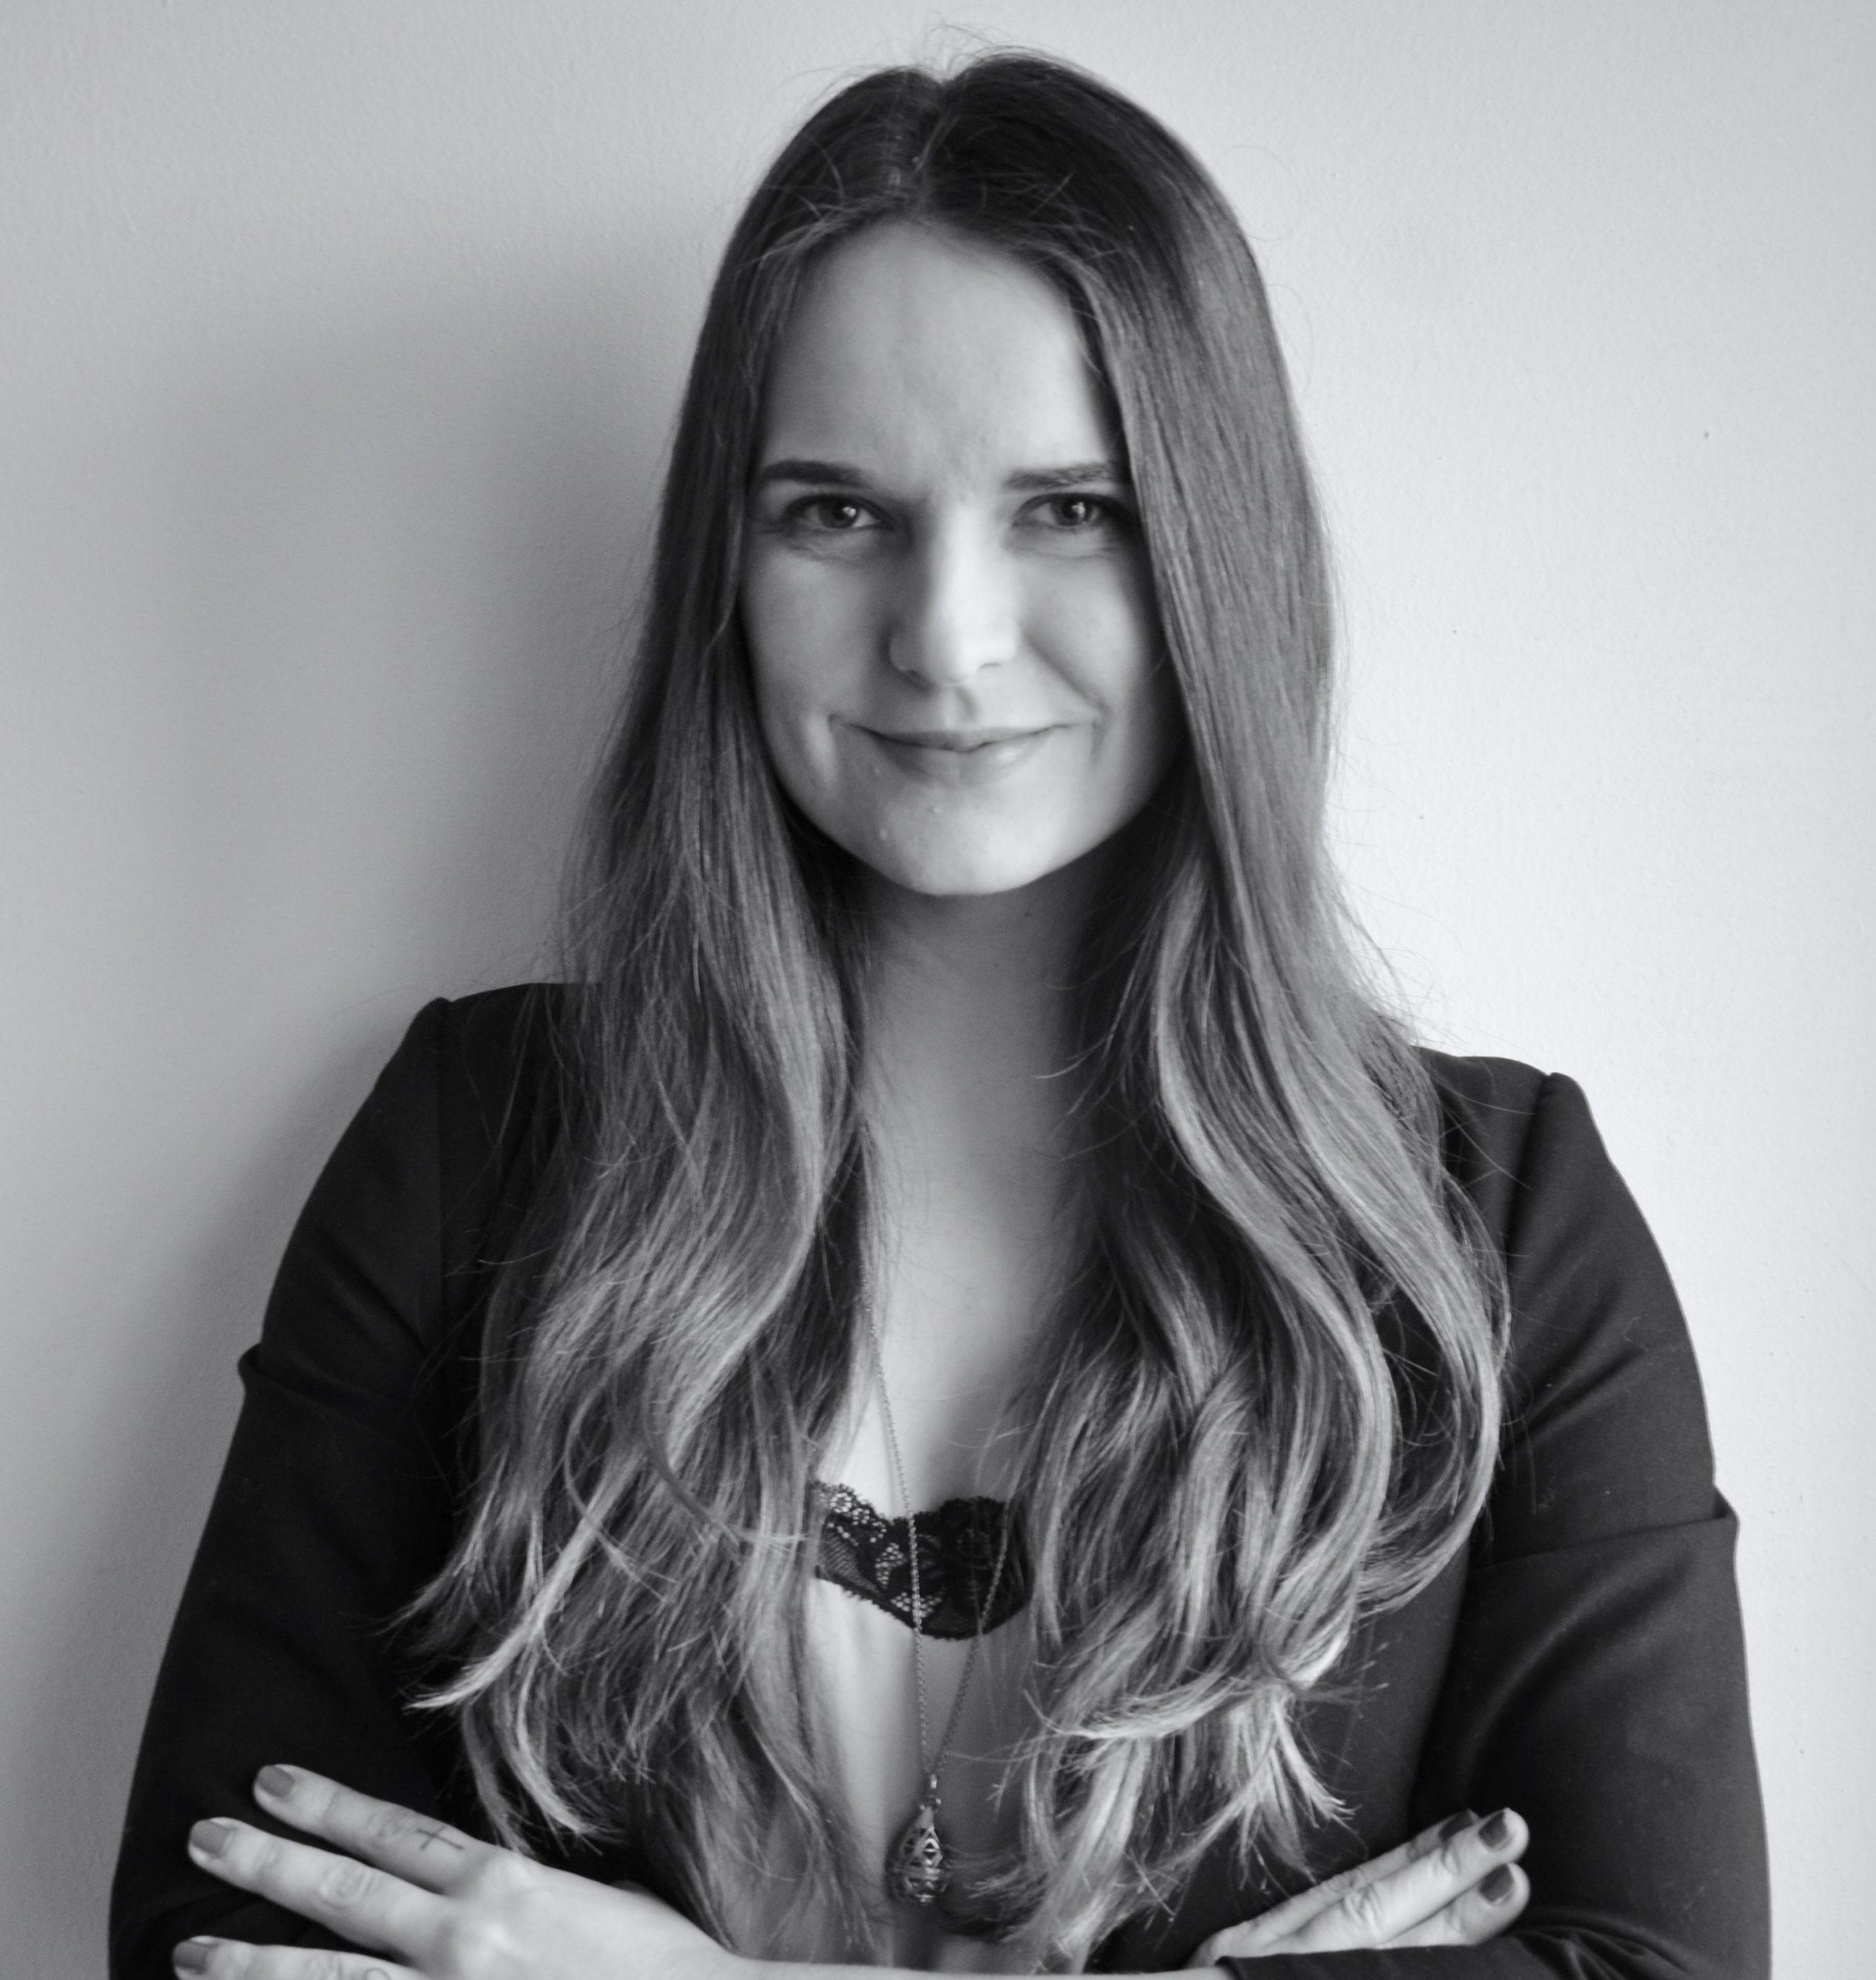 Julia Lorber